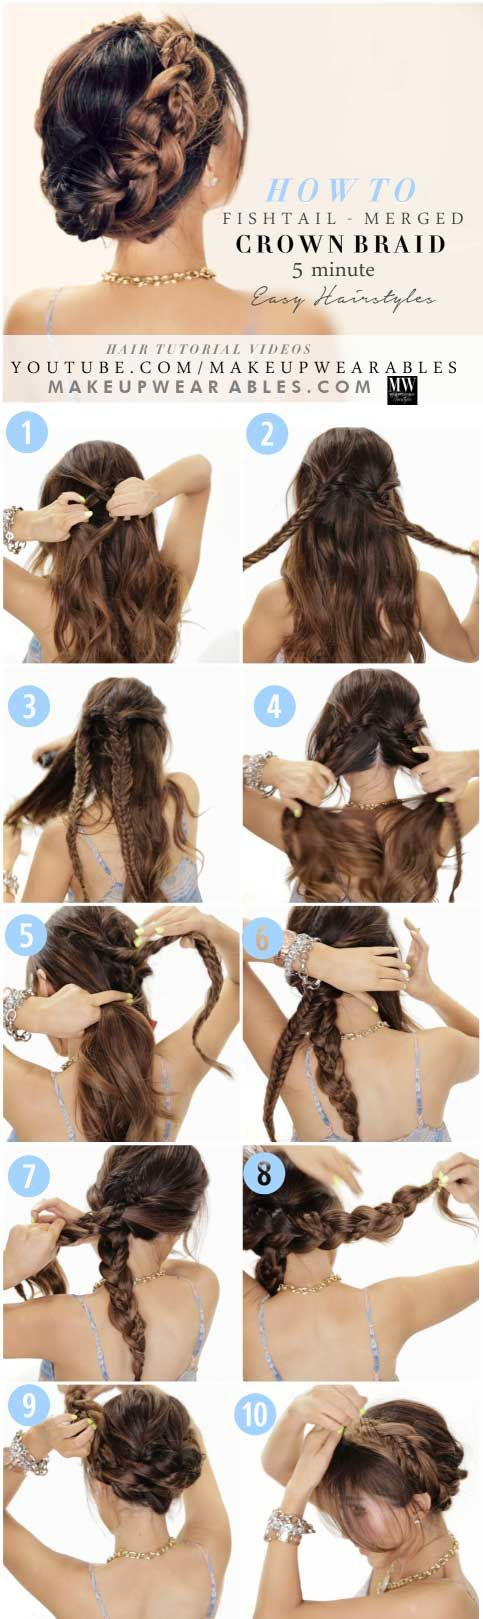 easy braided crown